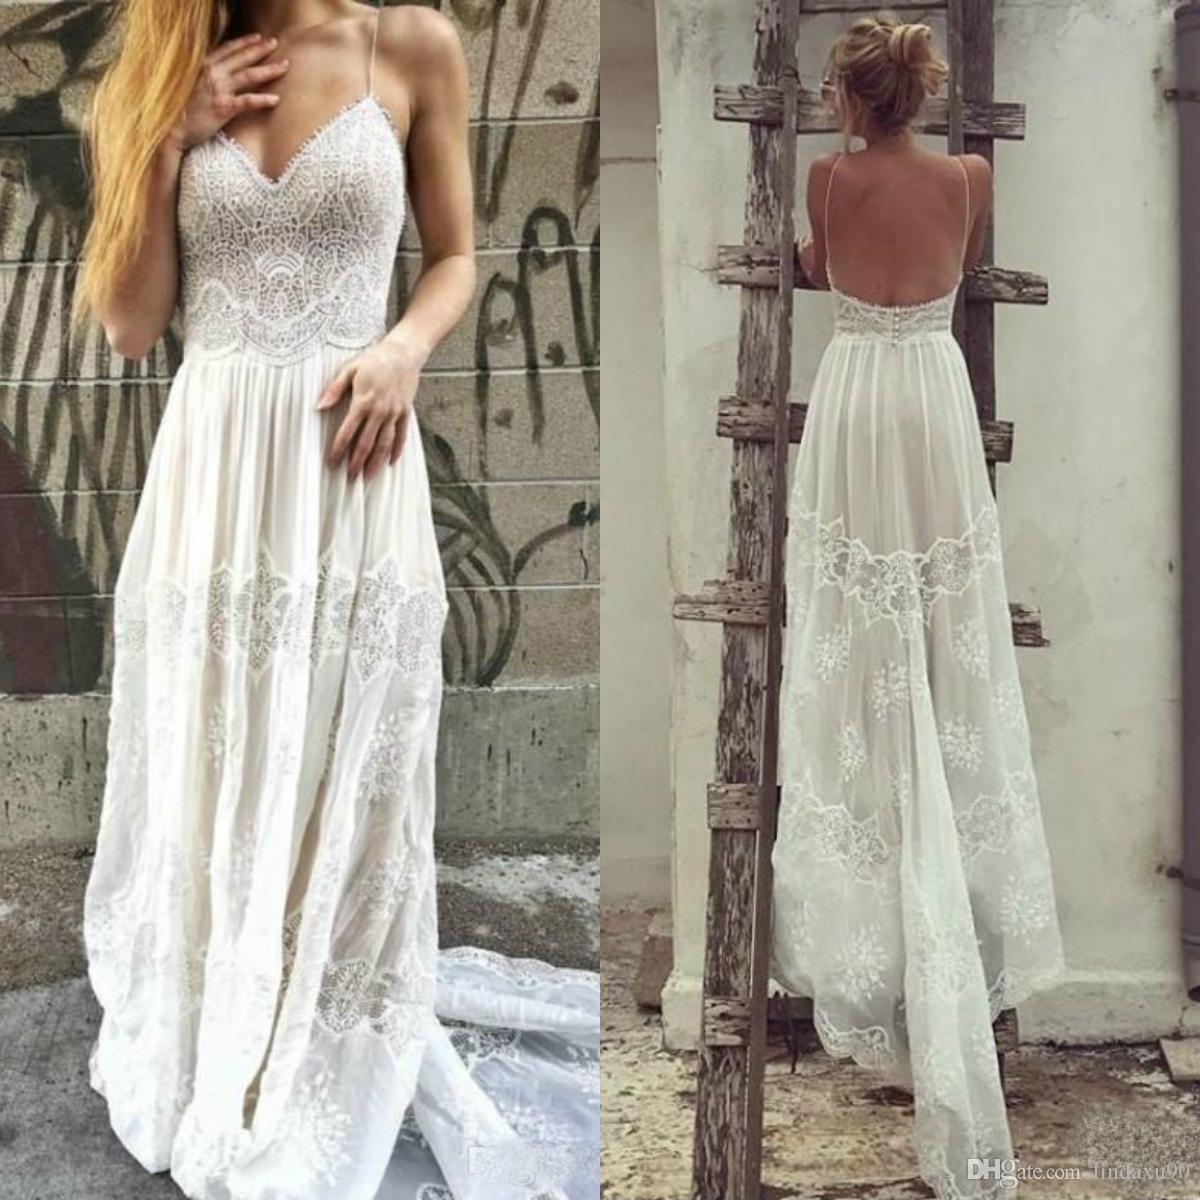 2019 Bohemian Lace Wedding Dresses A Line Sexy Spaghetti Neck Bridal Gowns Boho vestidos de novia Beach Wedding Dress